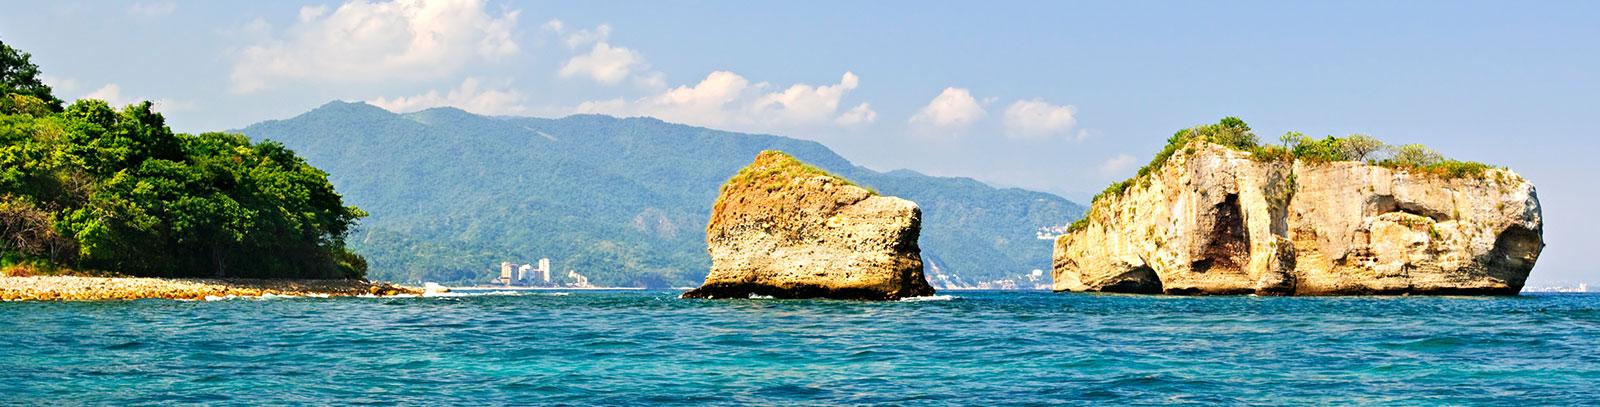 Riviera Nayarit, Mexico Attractions & Activities